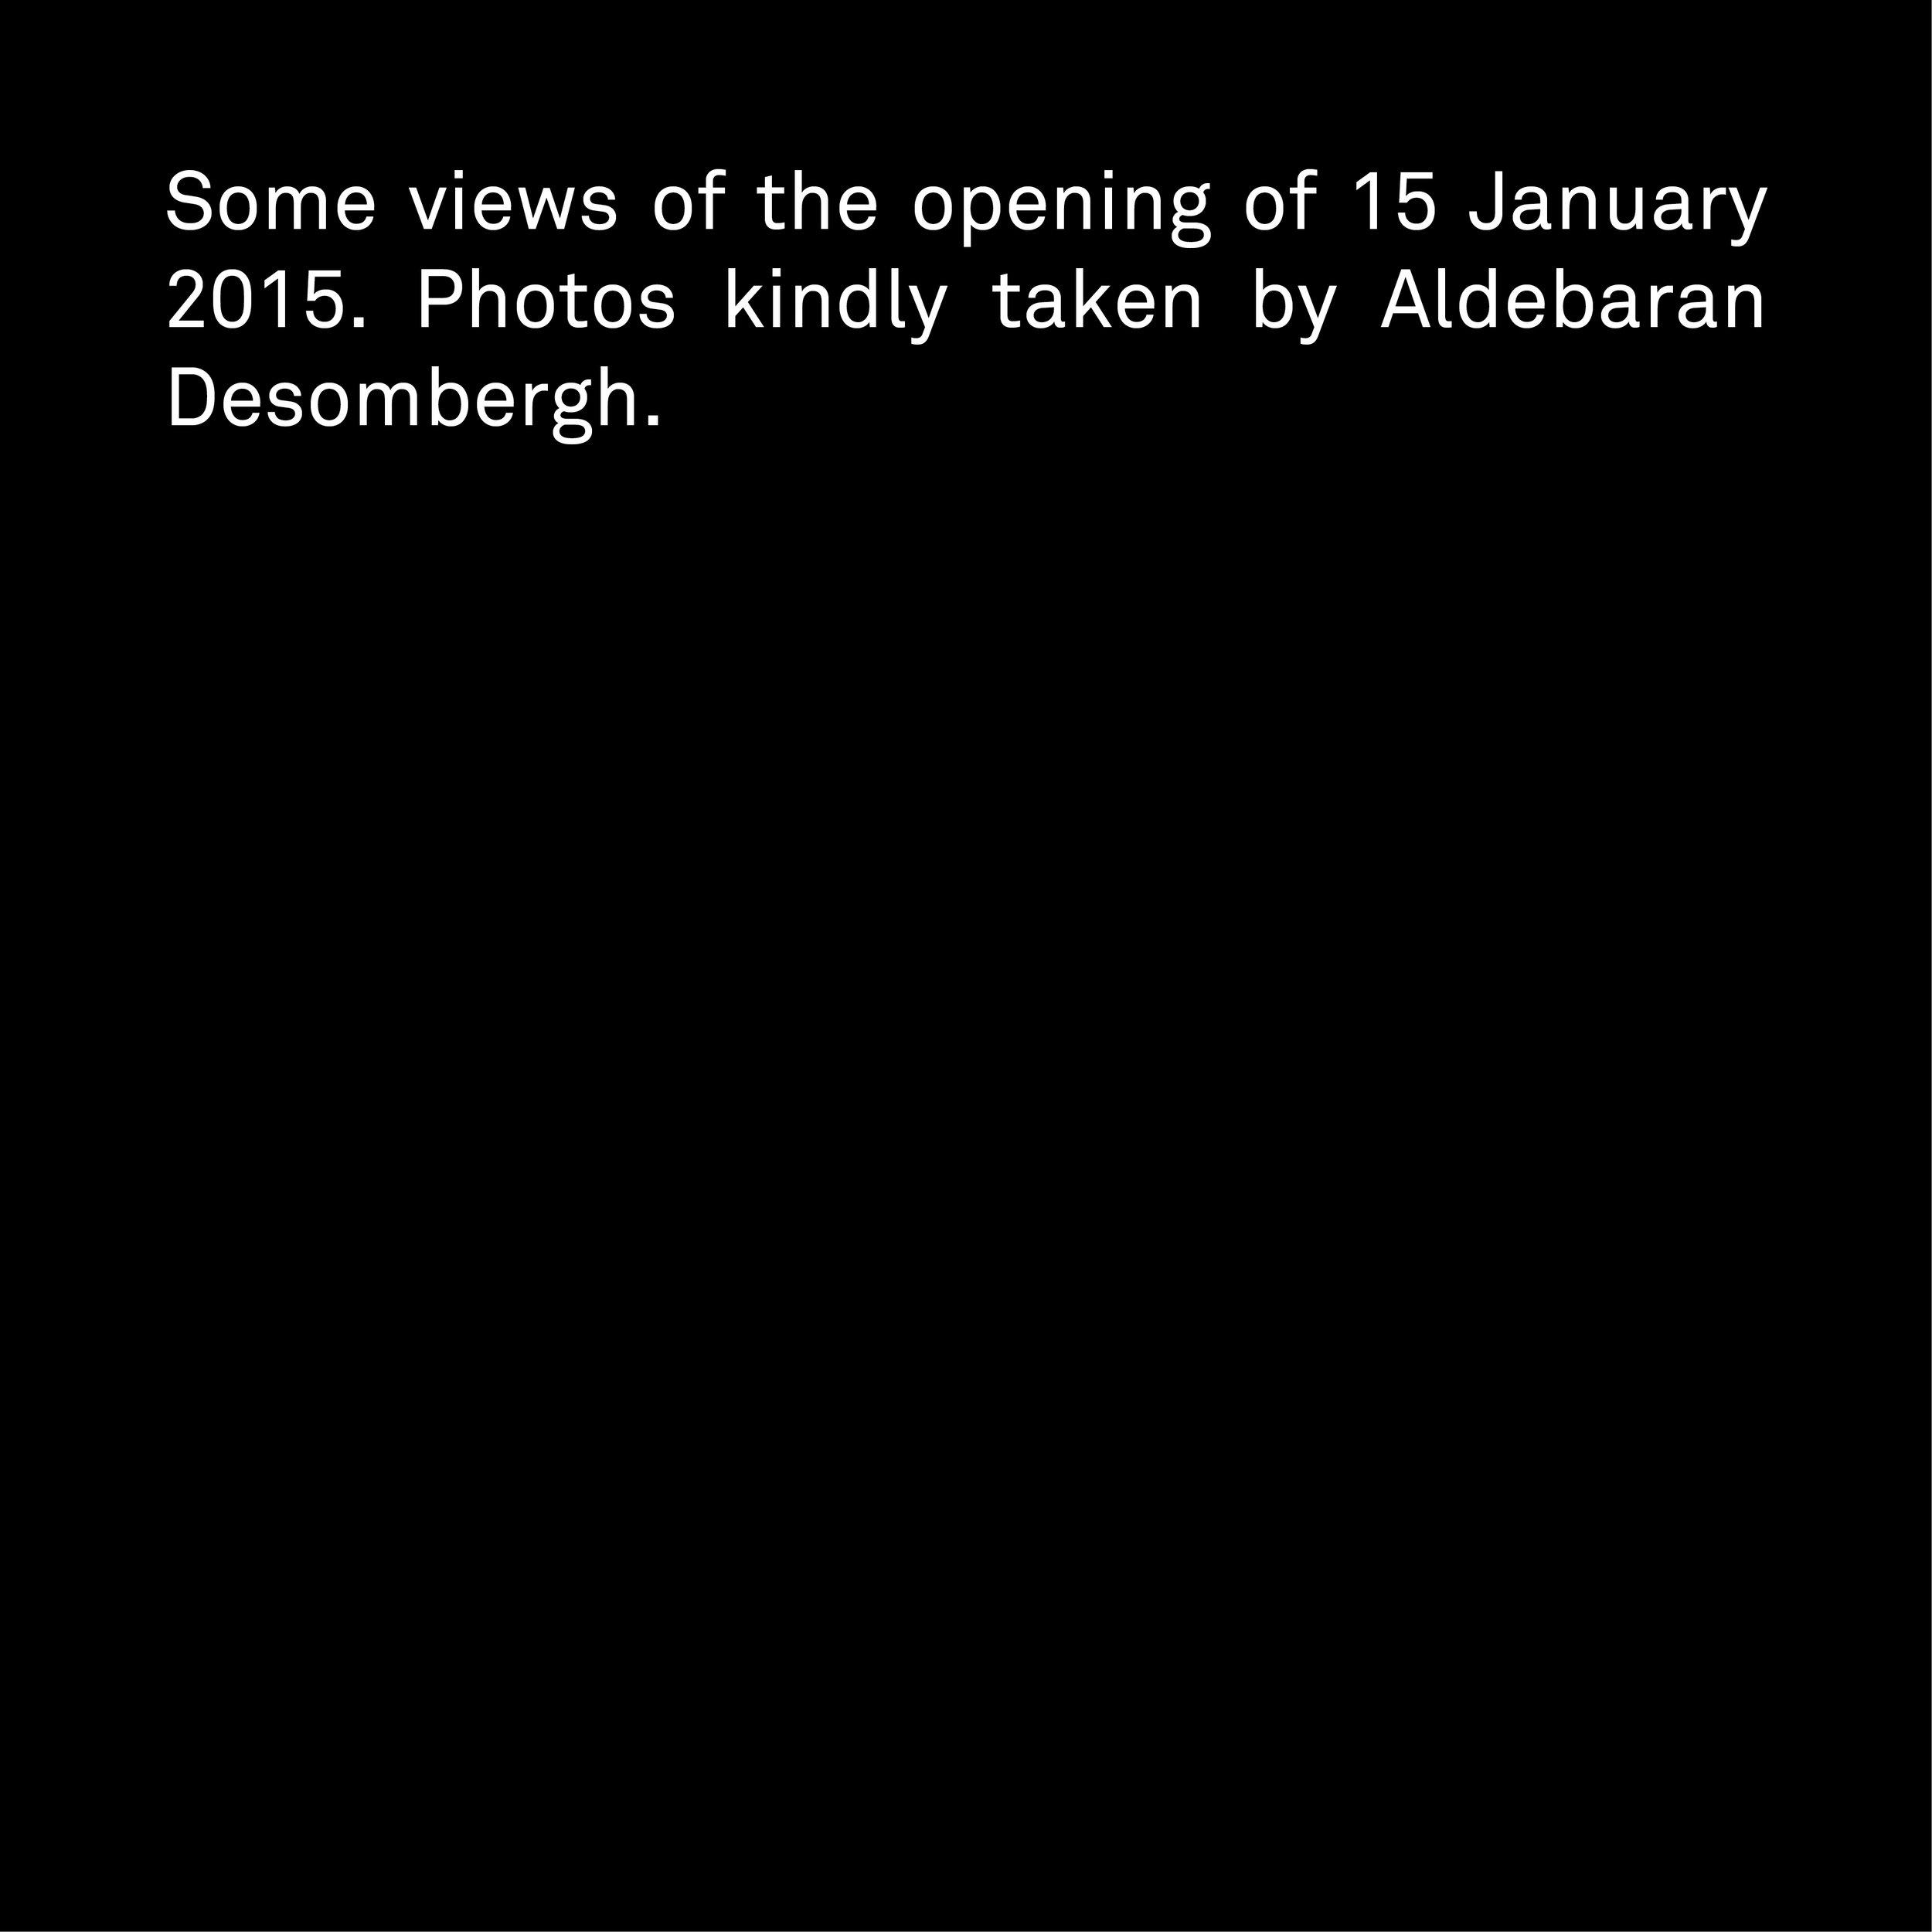 Rivoli Live Aldebaran Desombergh opening.jpg